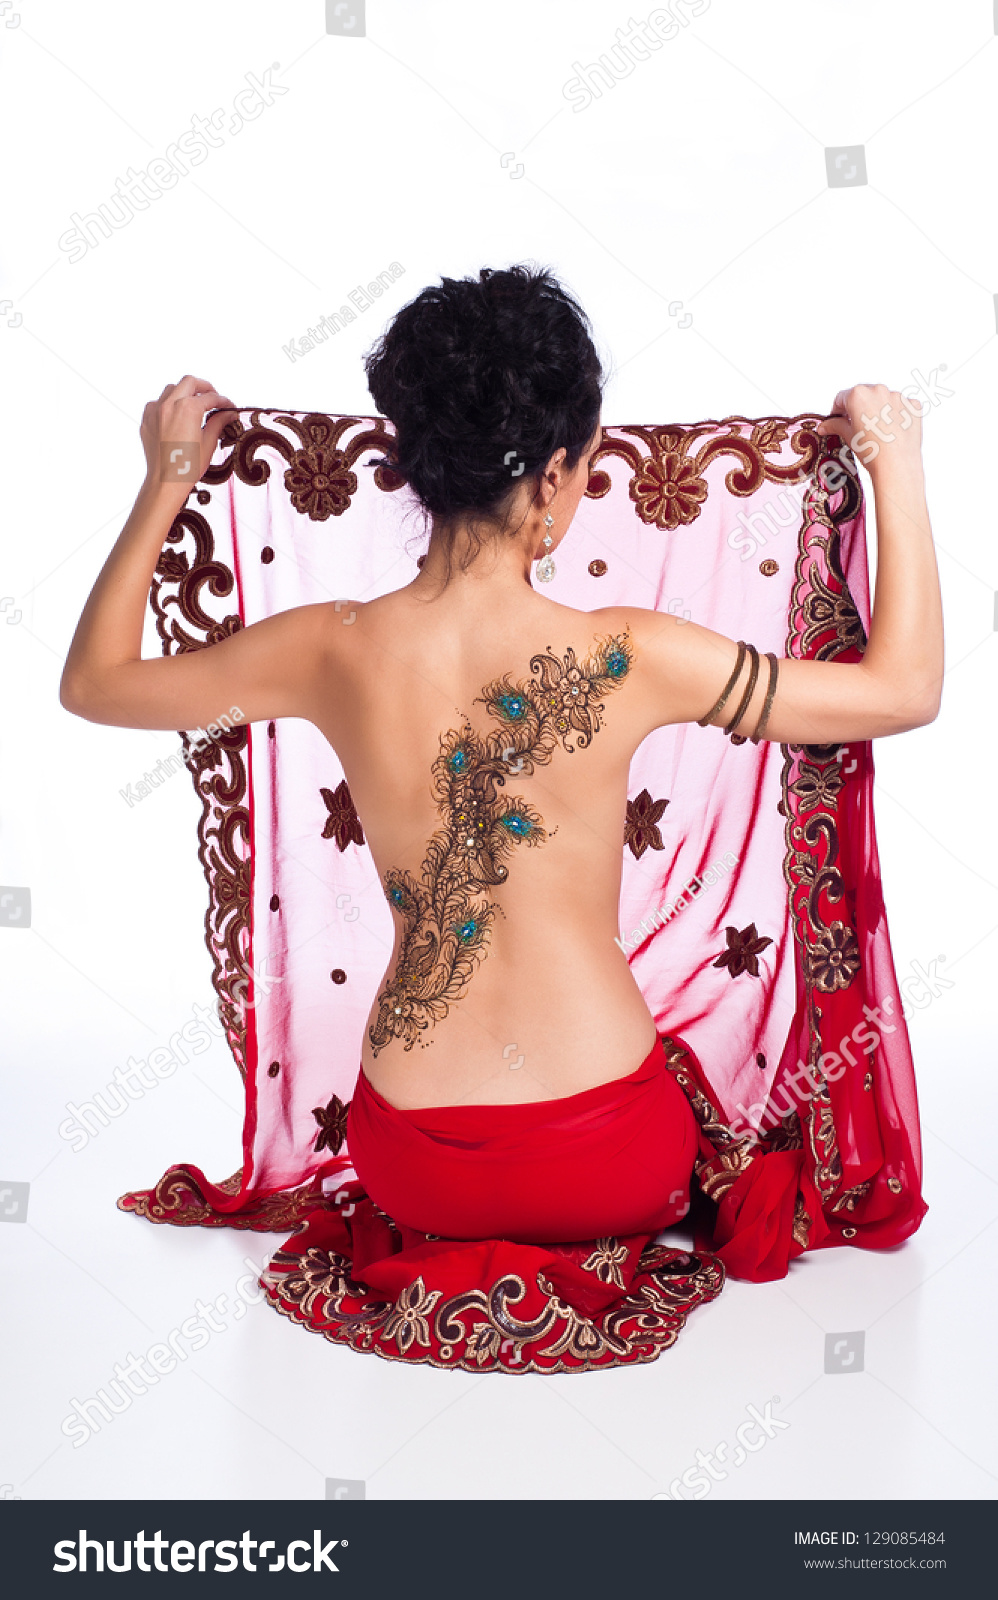 Фото девушки в сари со спины